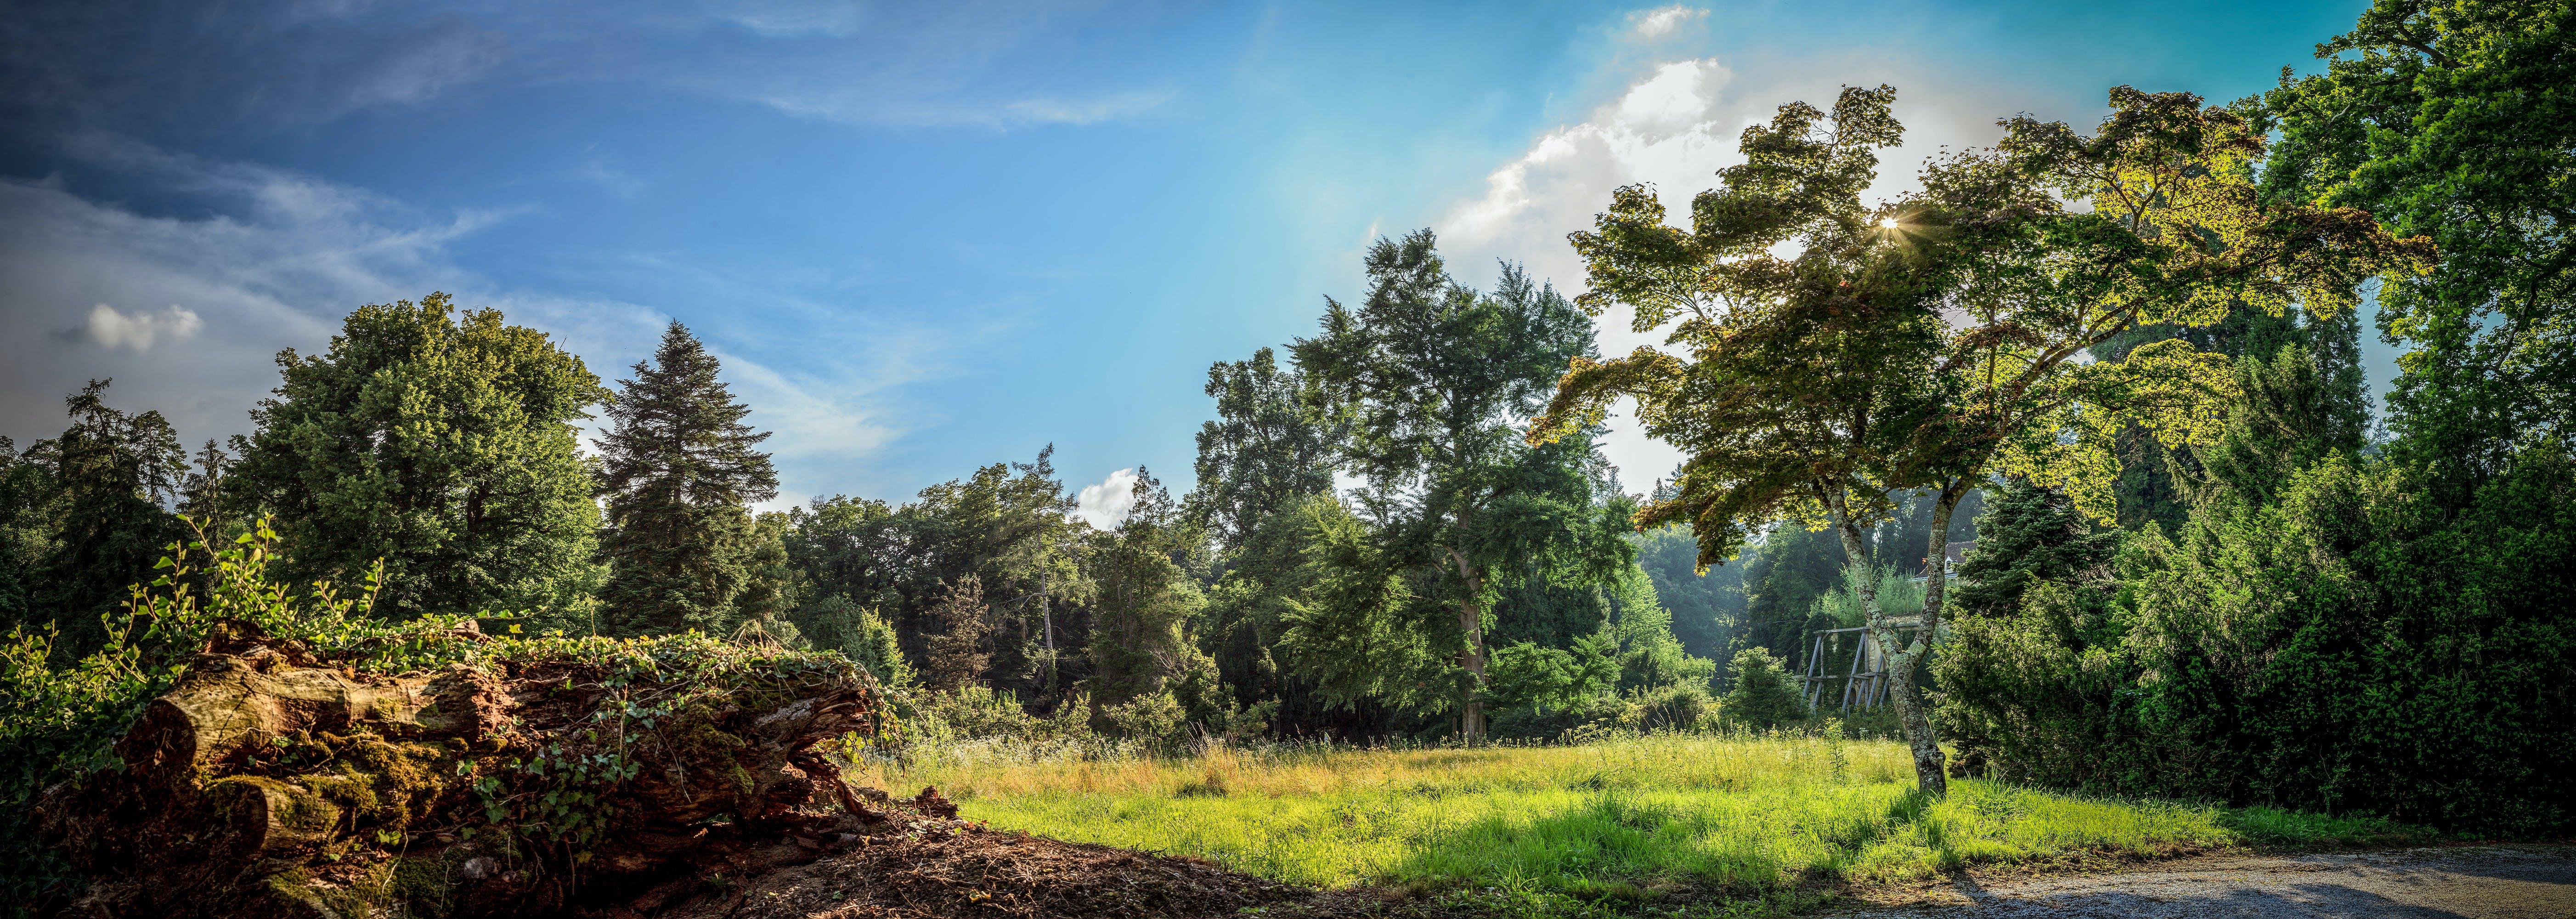 Free stock photo of arboretum, blue sky, clouds, croatia